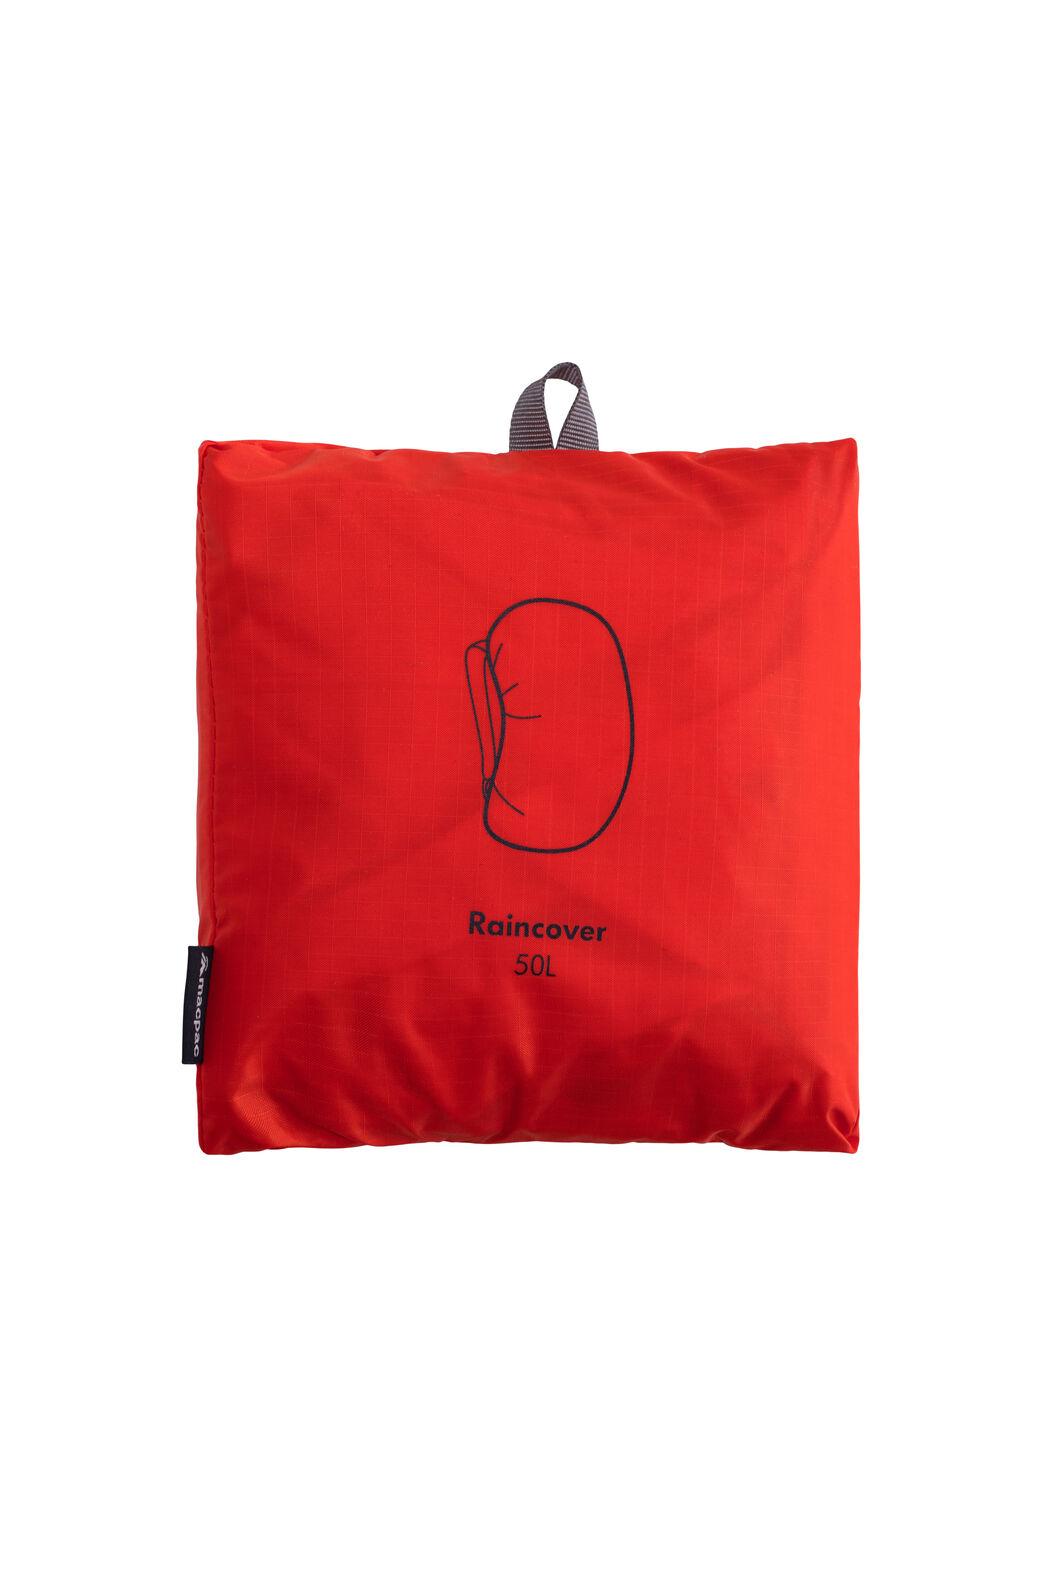 Macpac Pack Raincover 1.1 — Medium, Indicator, hi-res